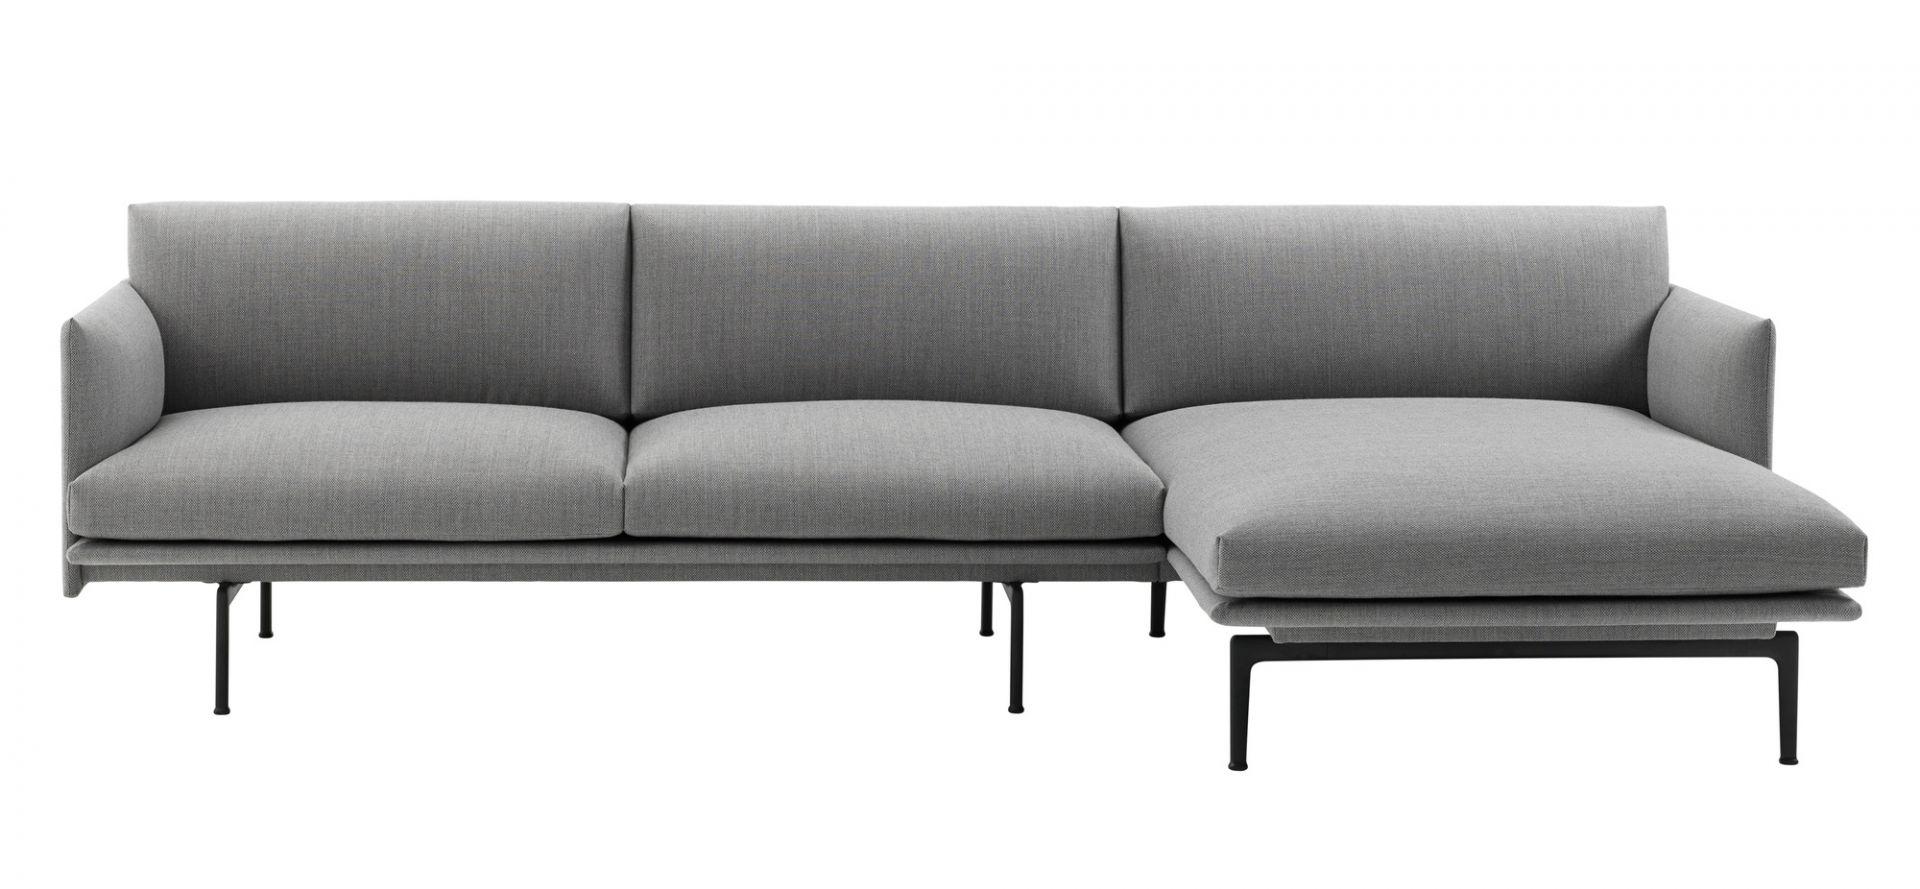 Outline Sofa Chaise Longue Muuto